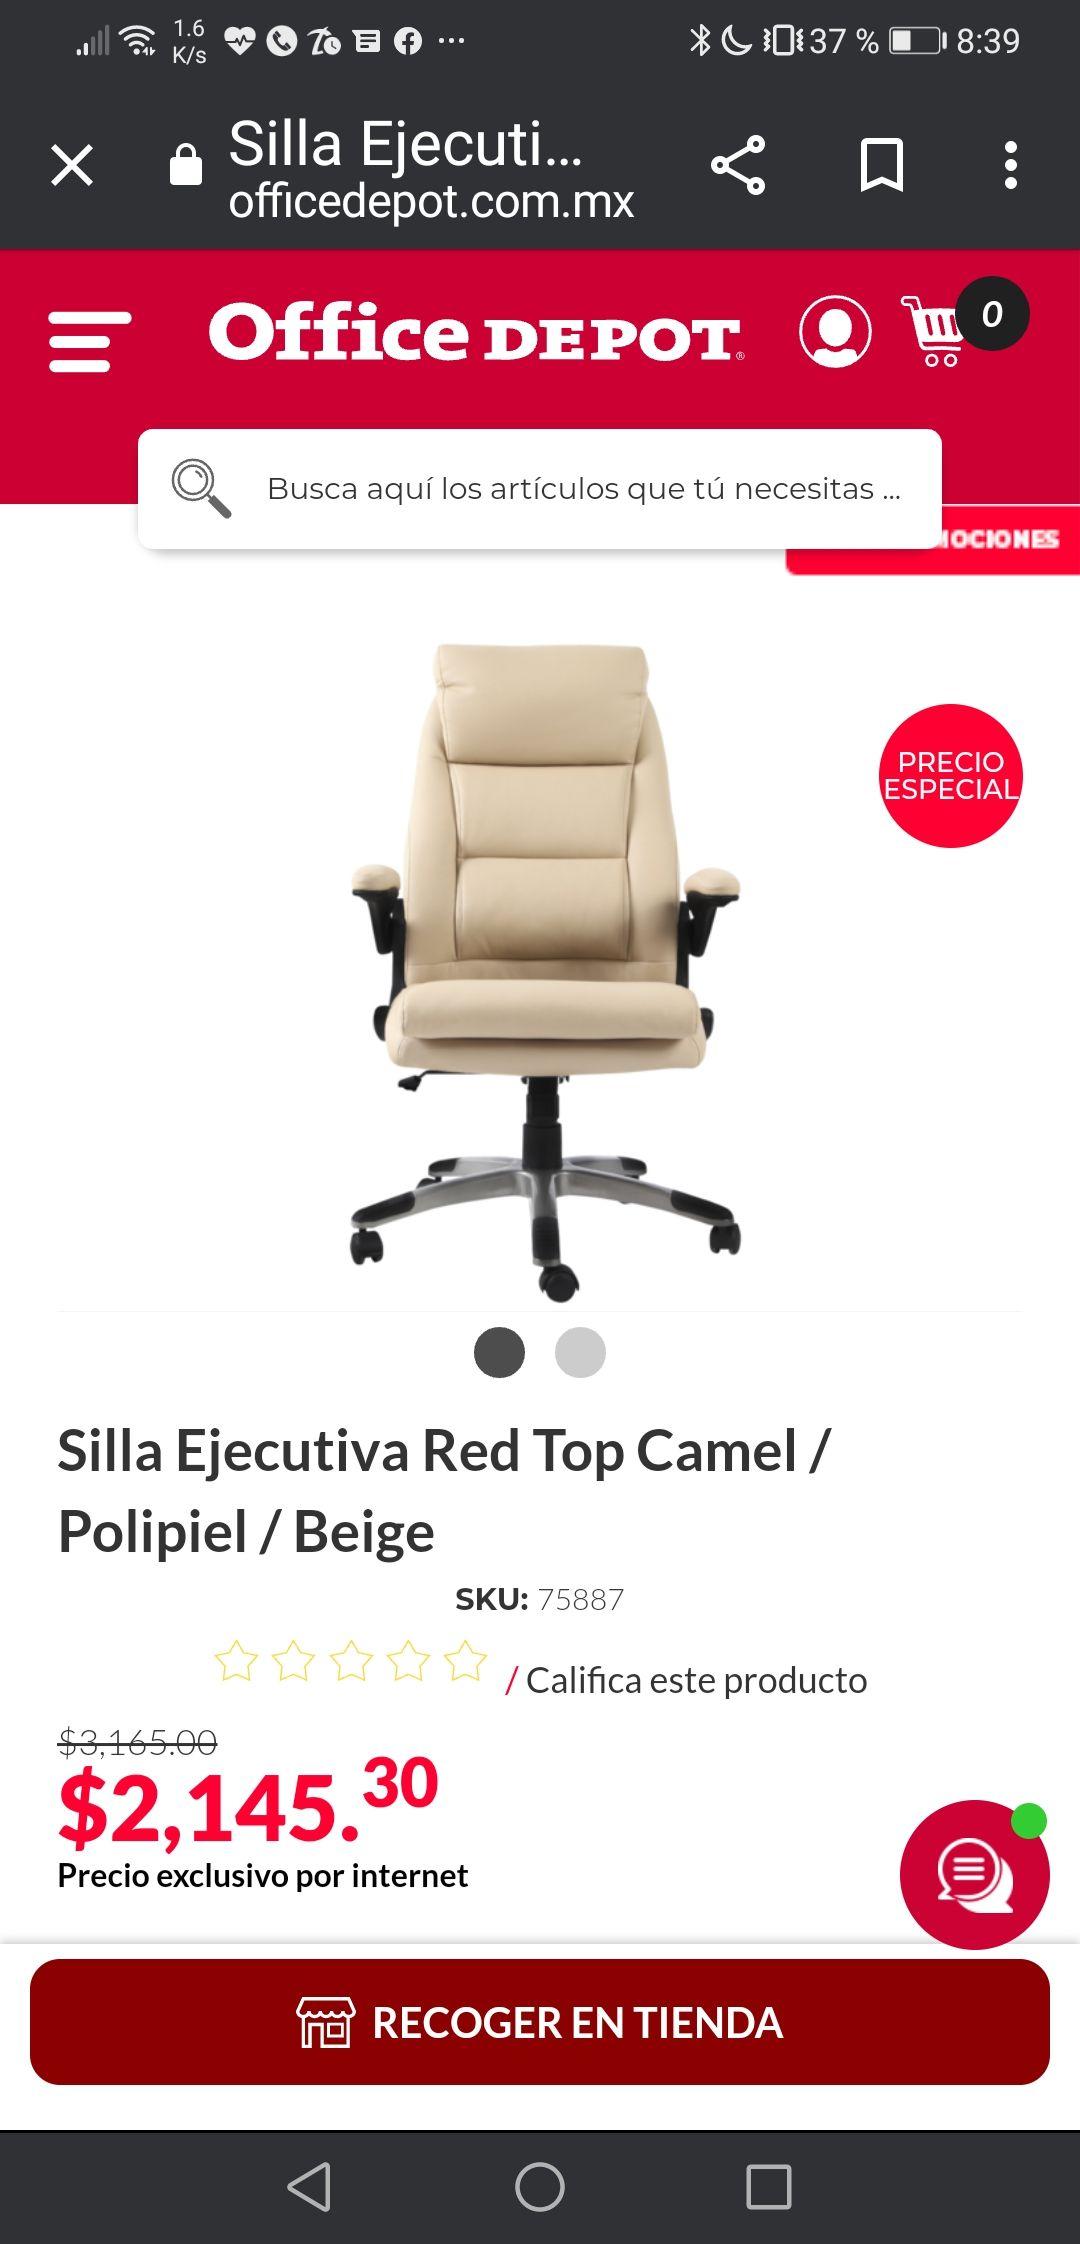 Office Depot: Silla Ejecutiva 1000 pesos más barata que la semana pasada